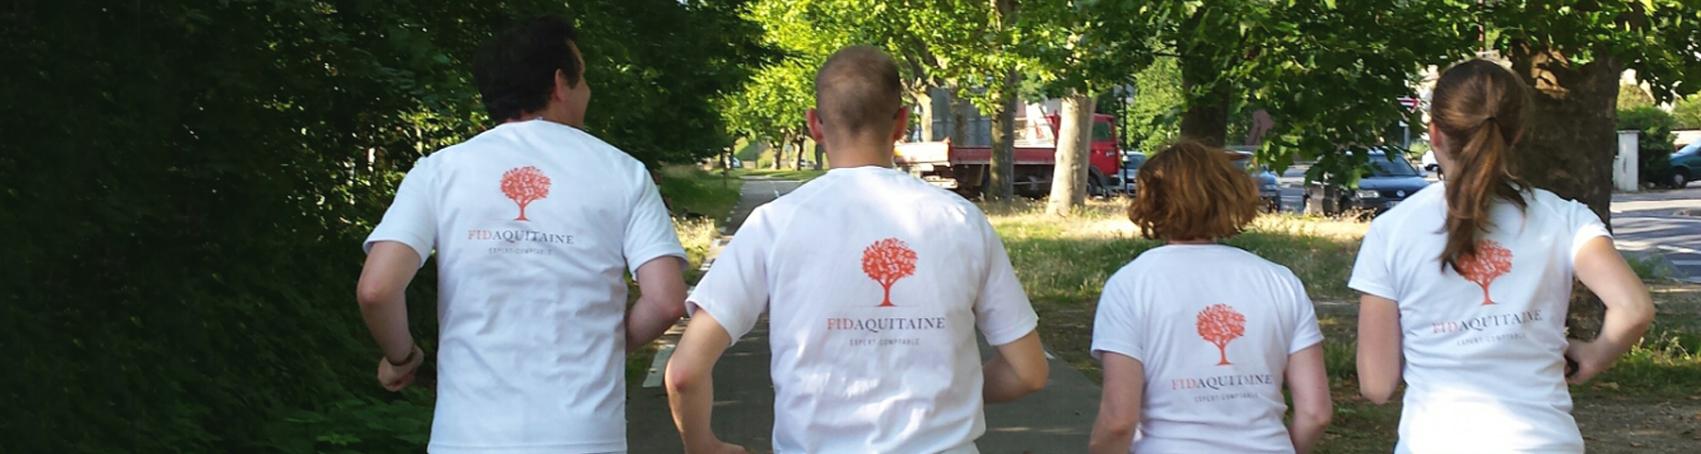 Fidrunning courir avec Fidaquiatine